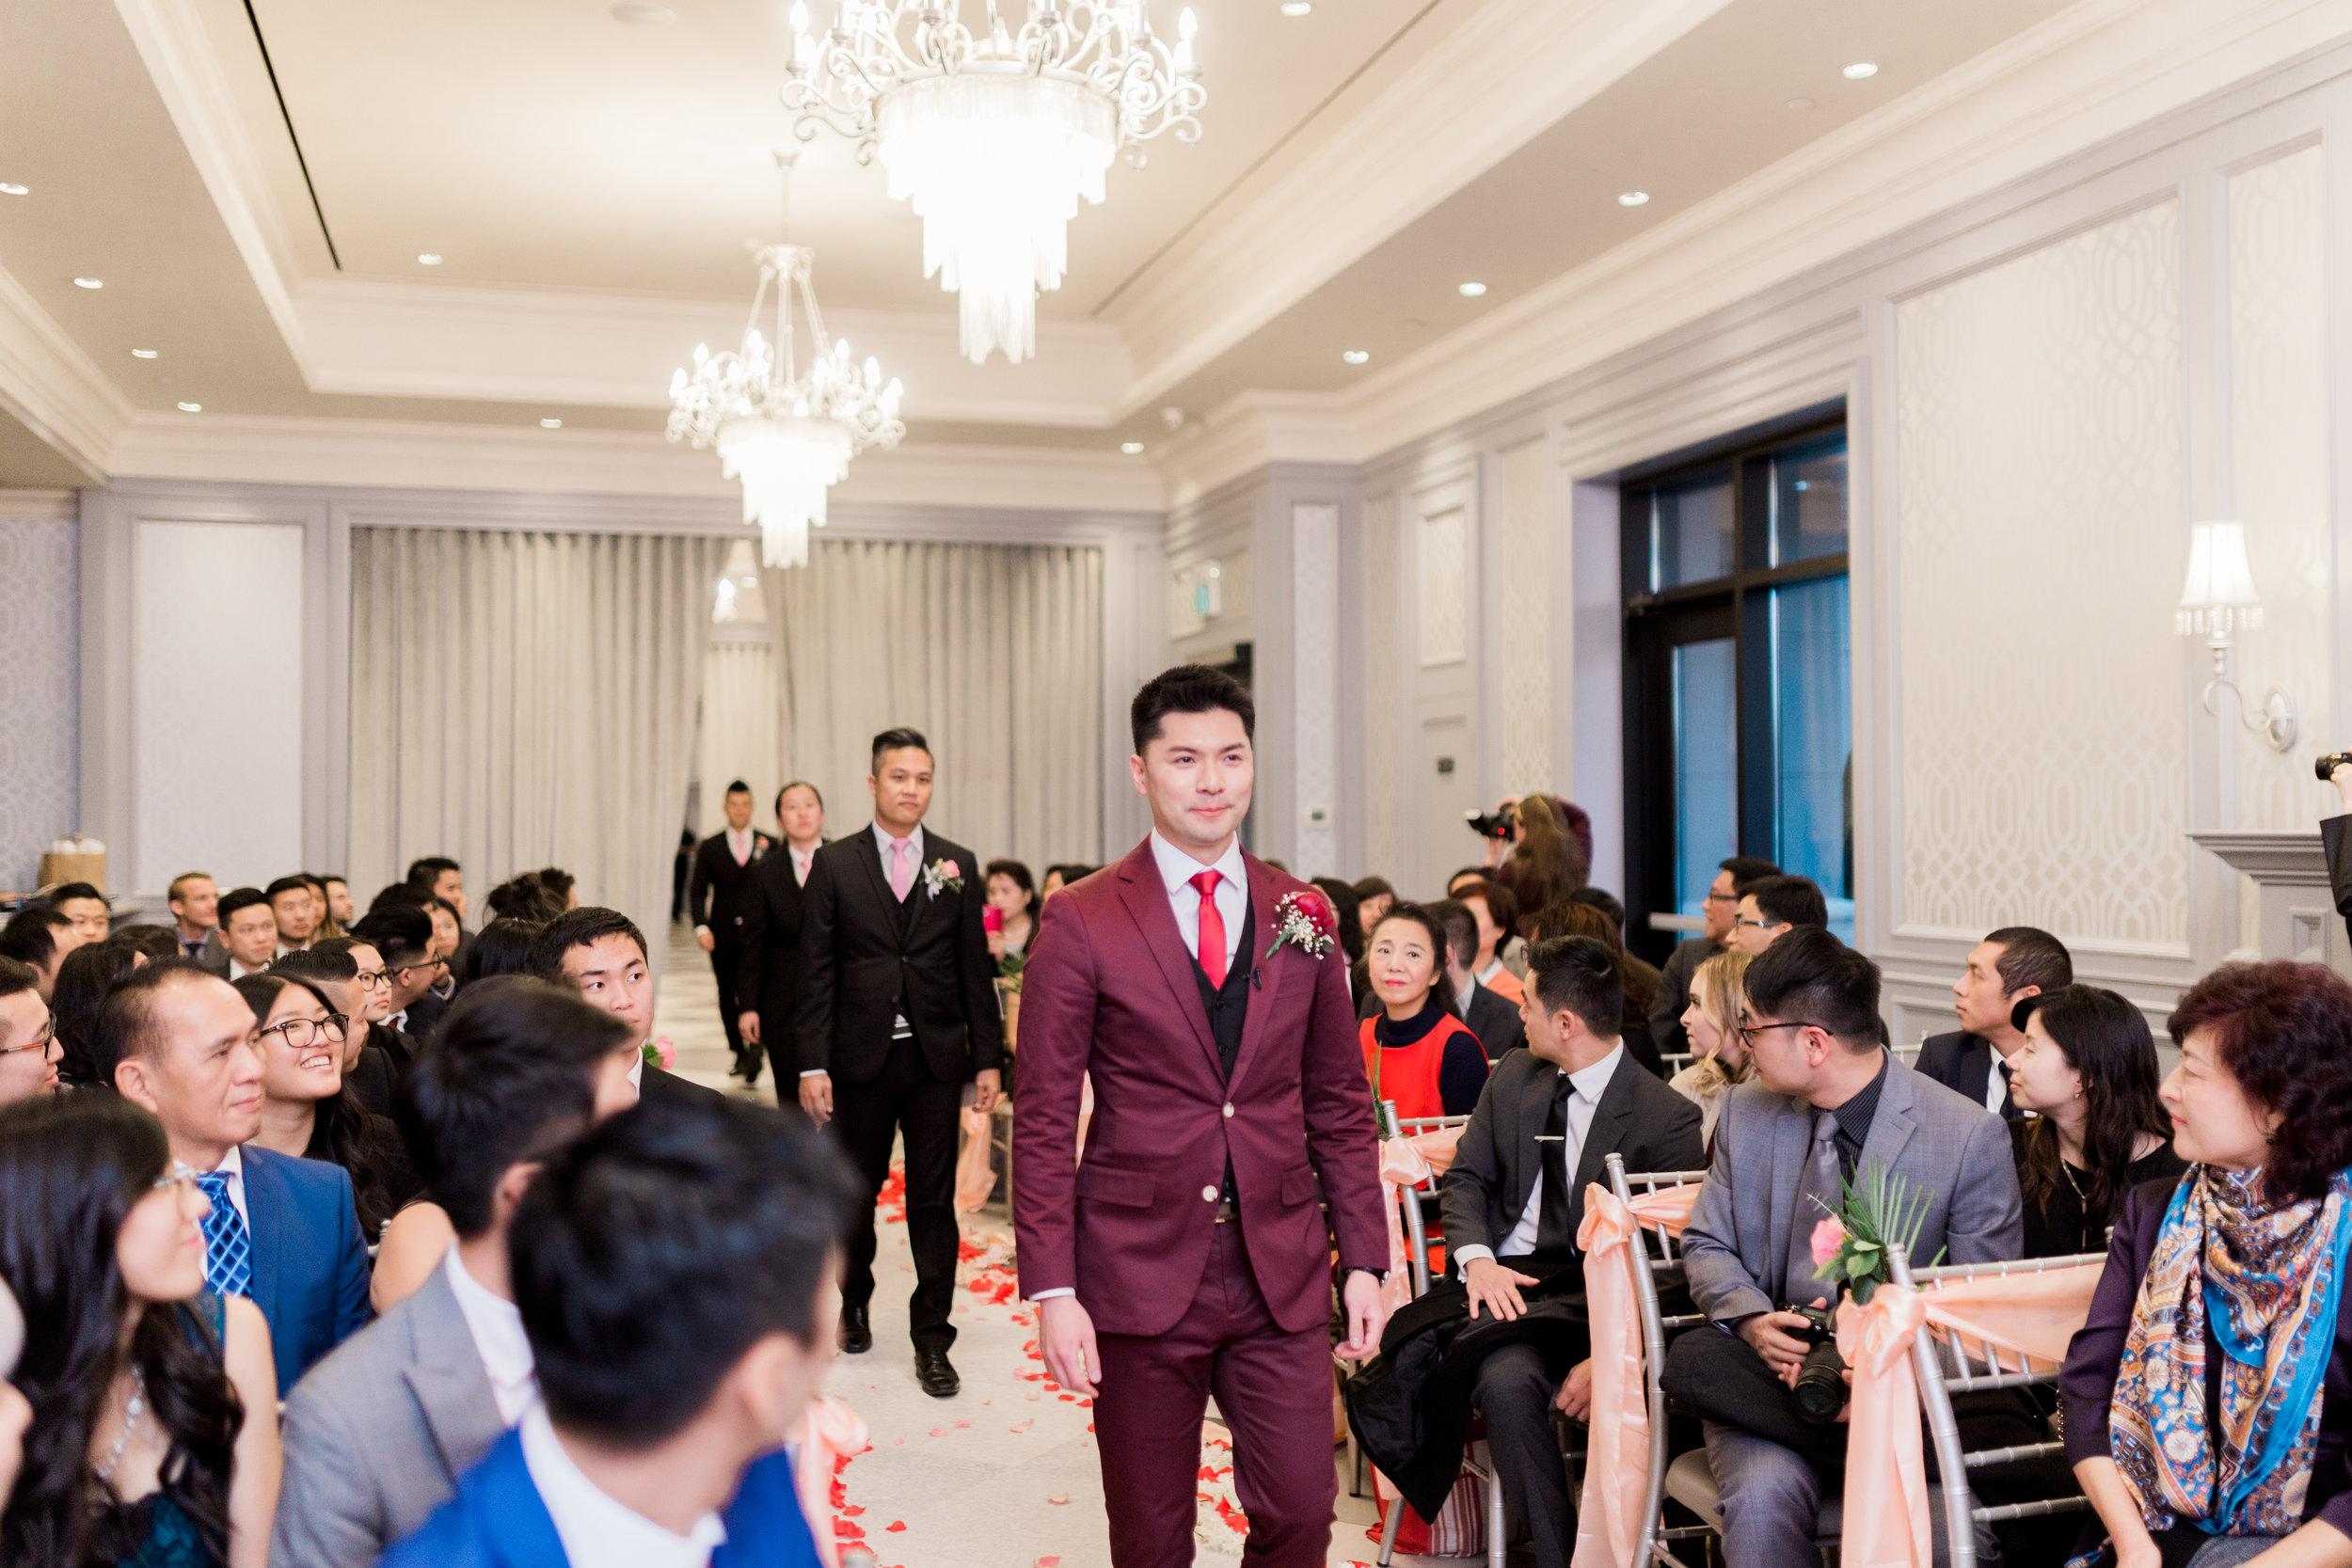 Parkview Manor Wedding - Ceremony-46.jpg